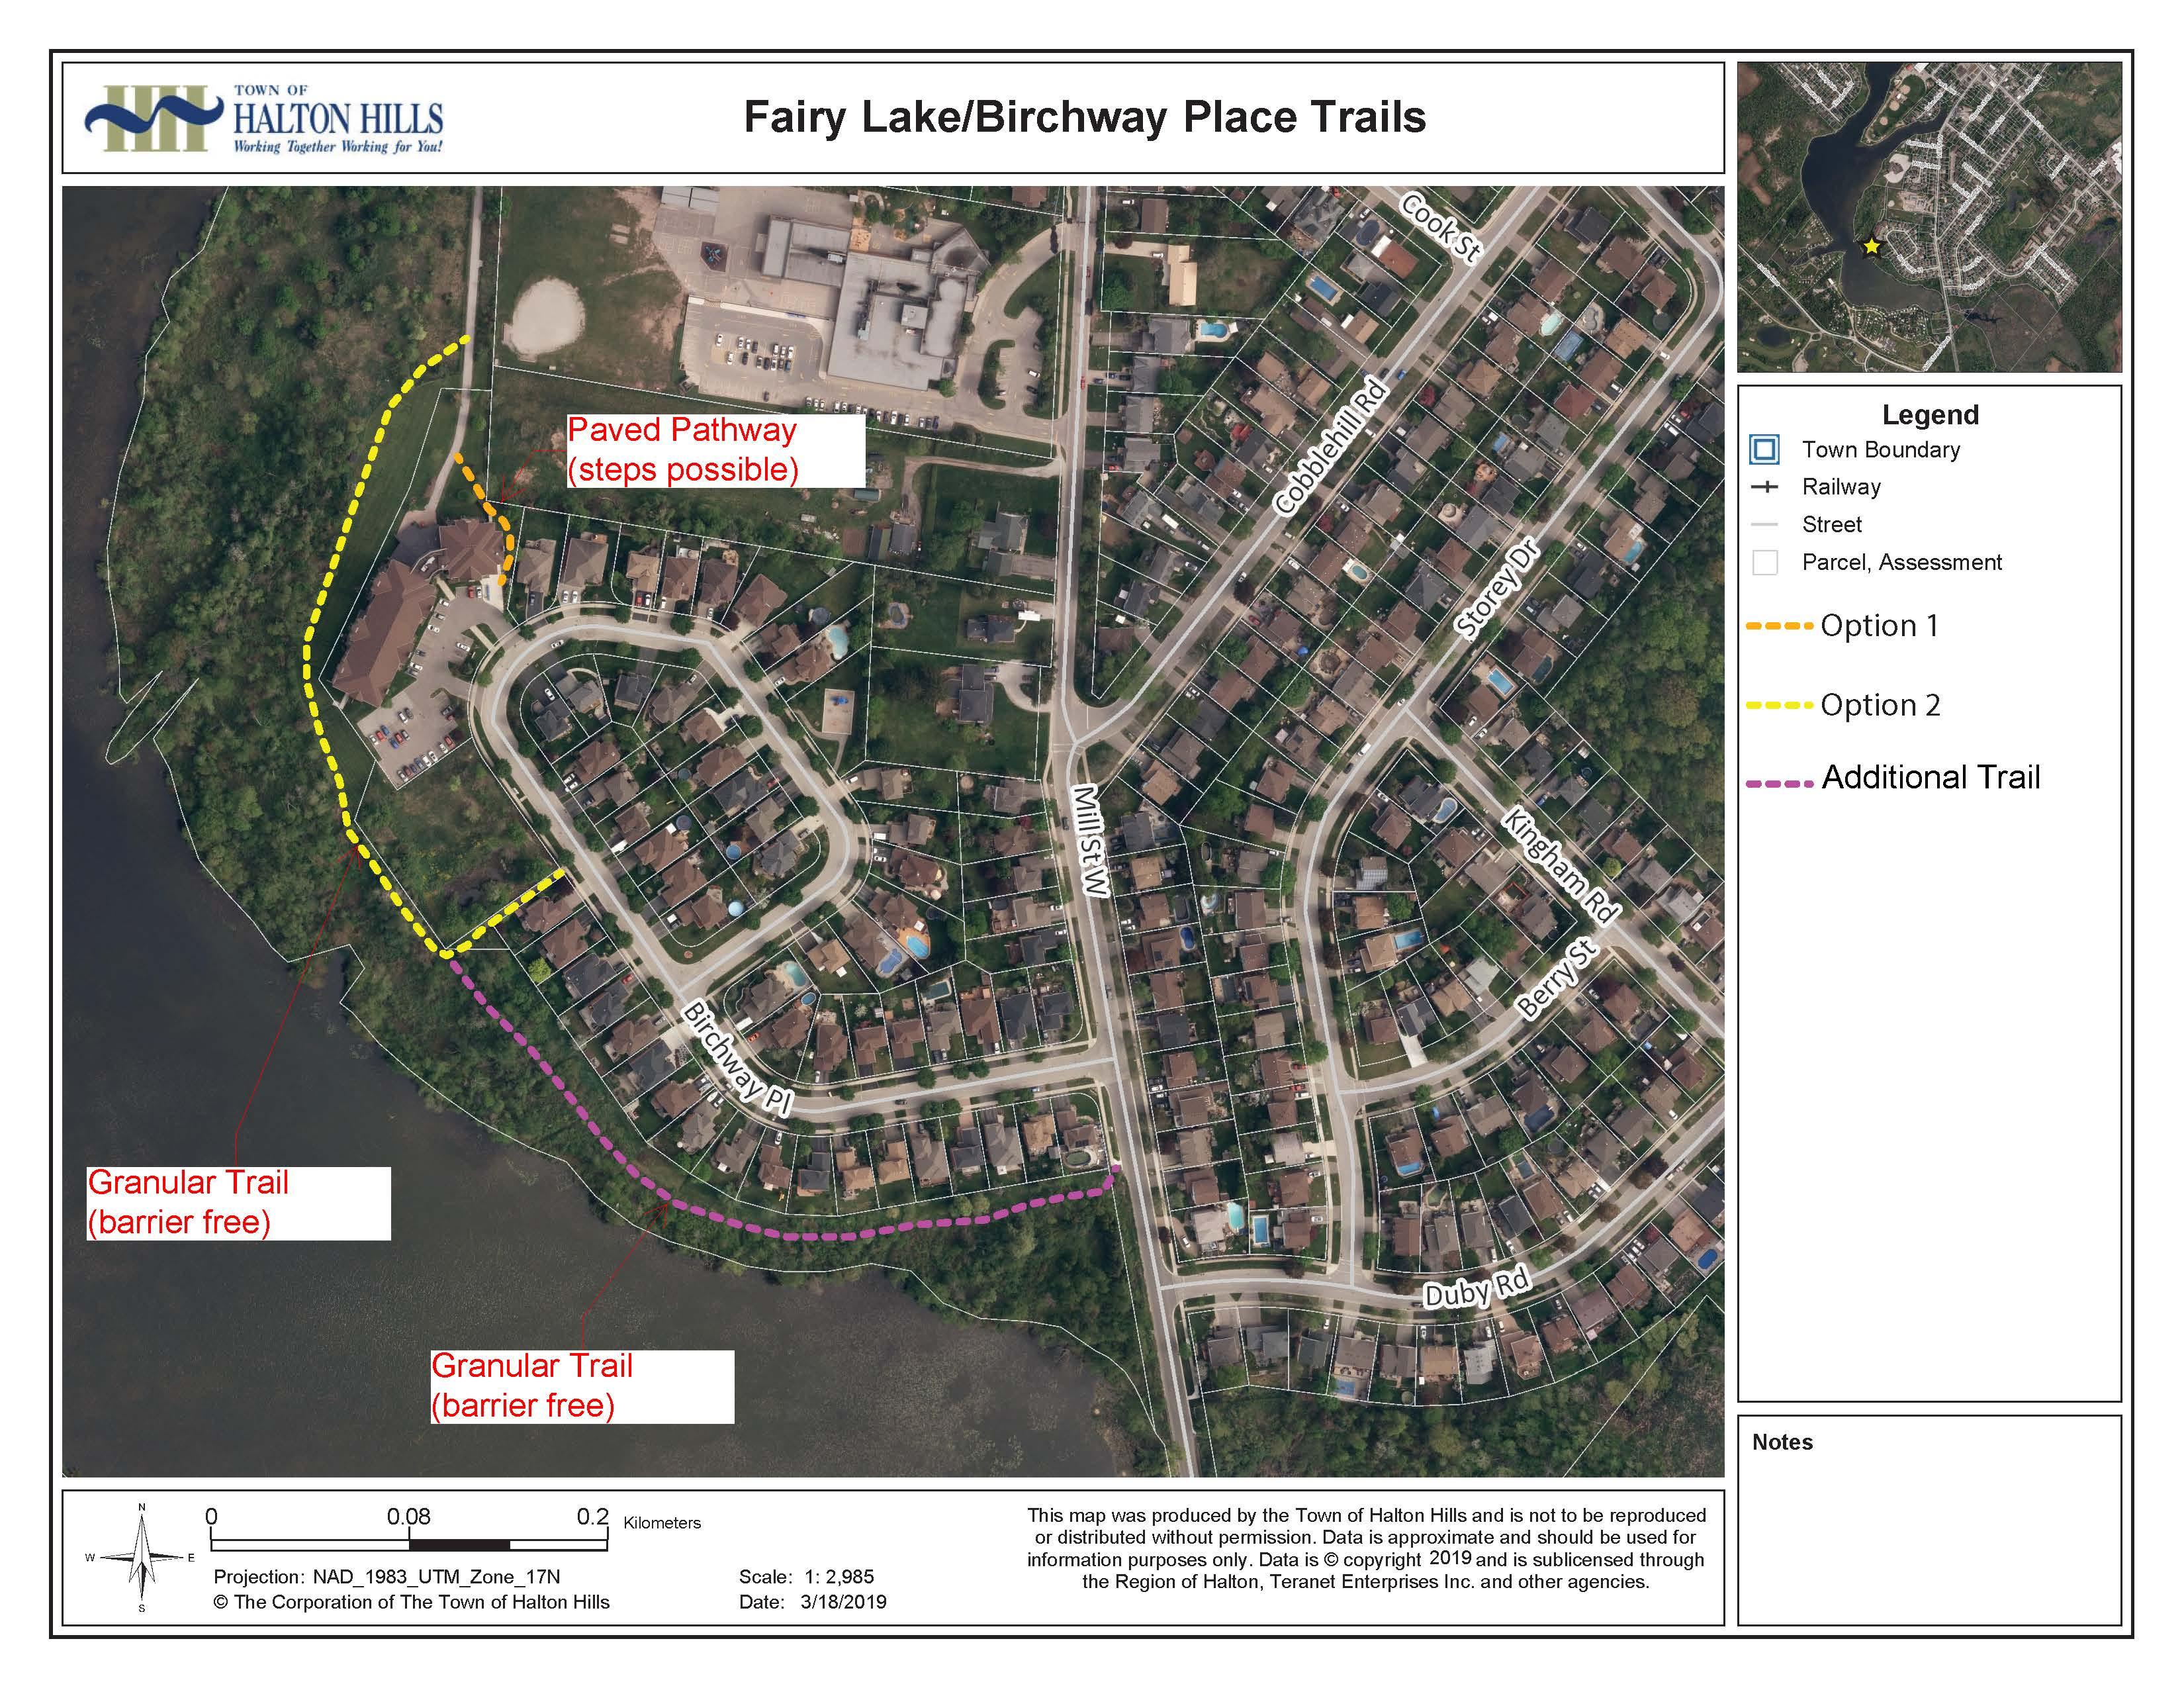 2019 birchway place trails